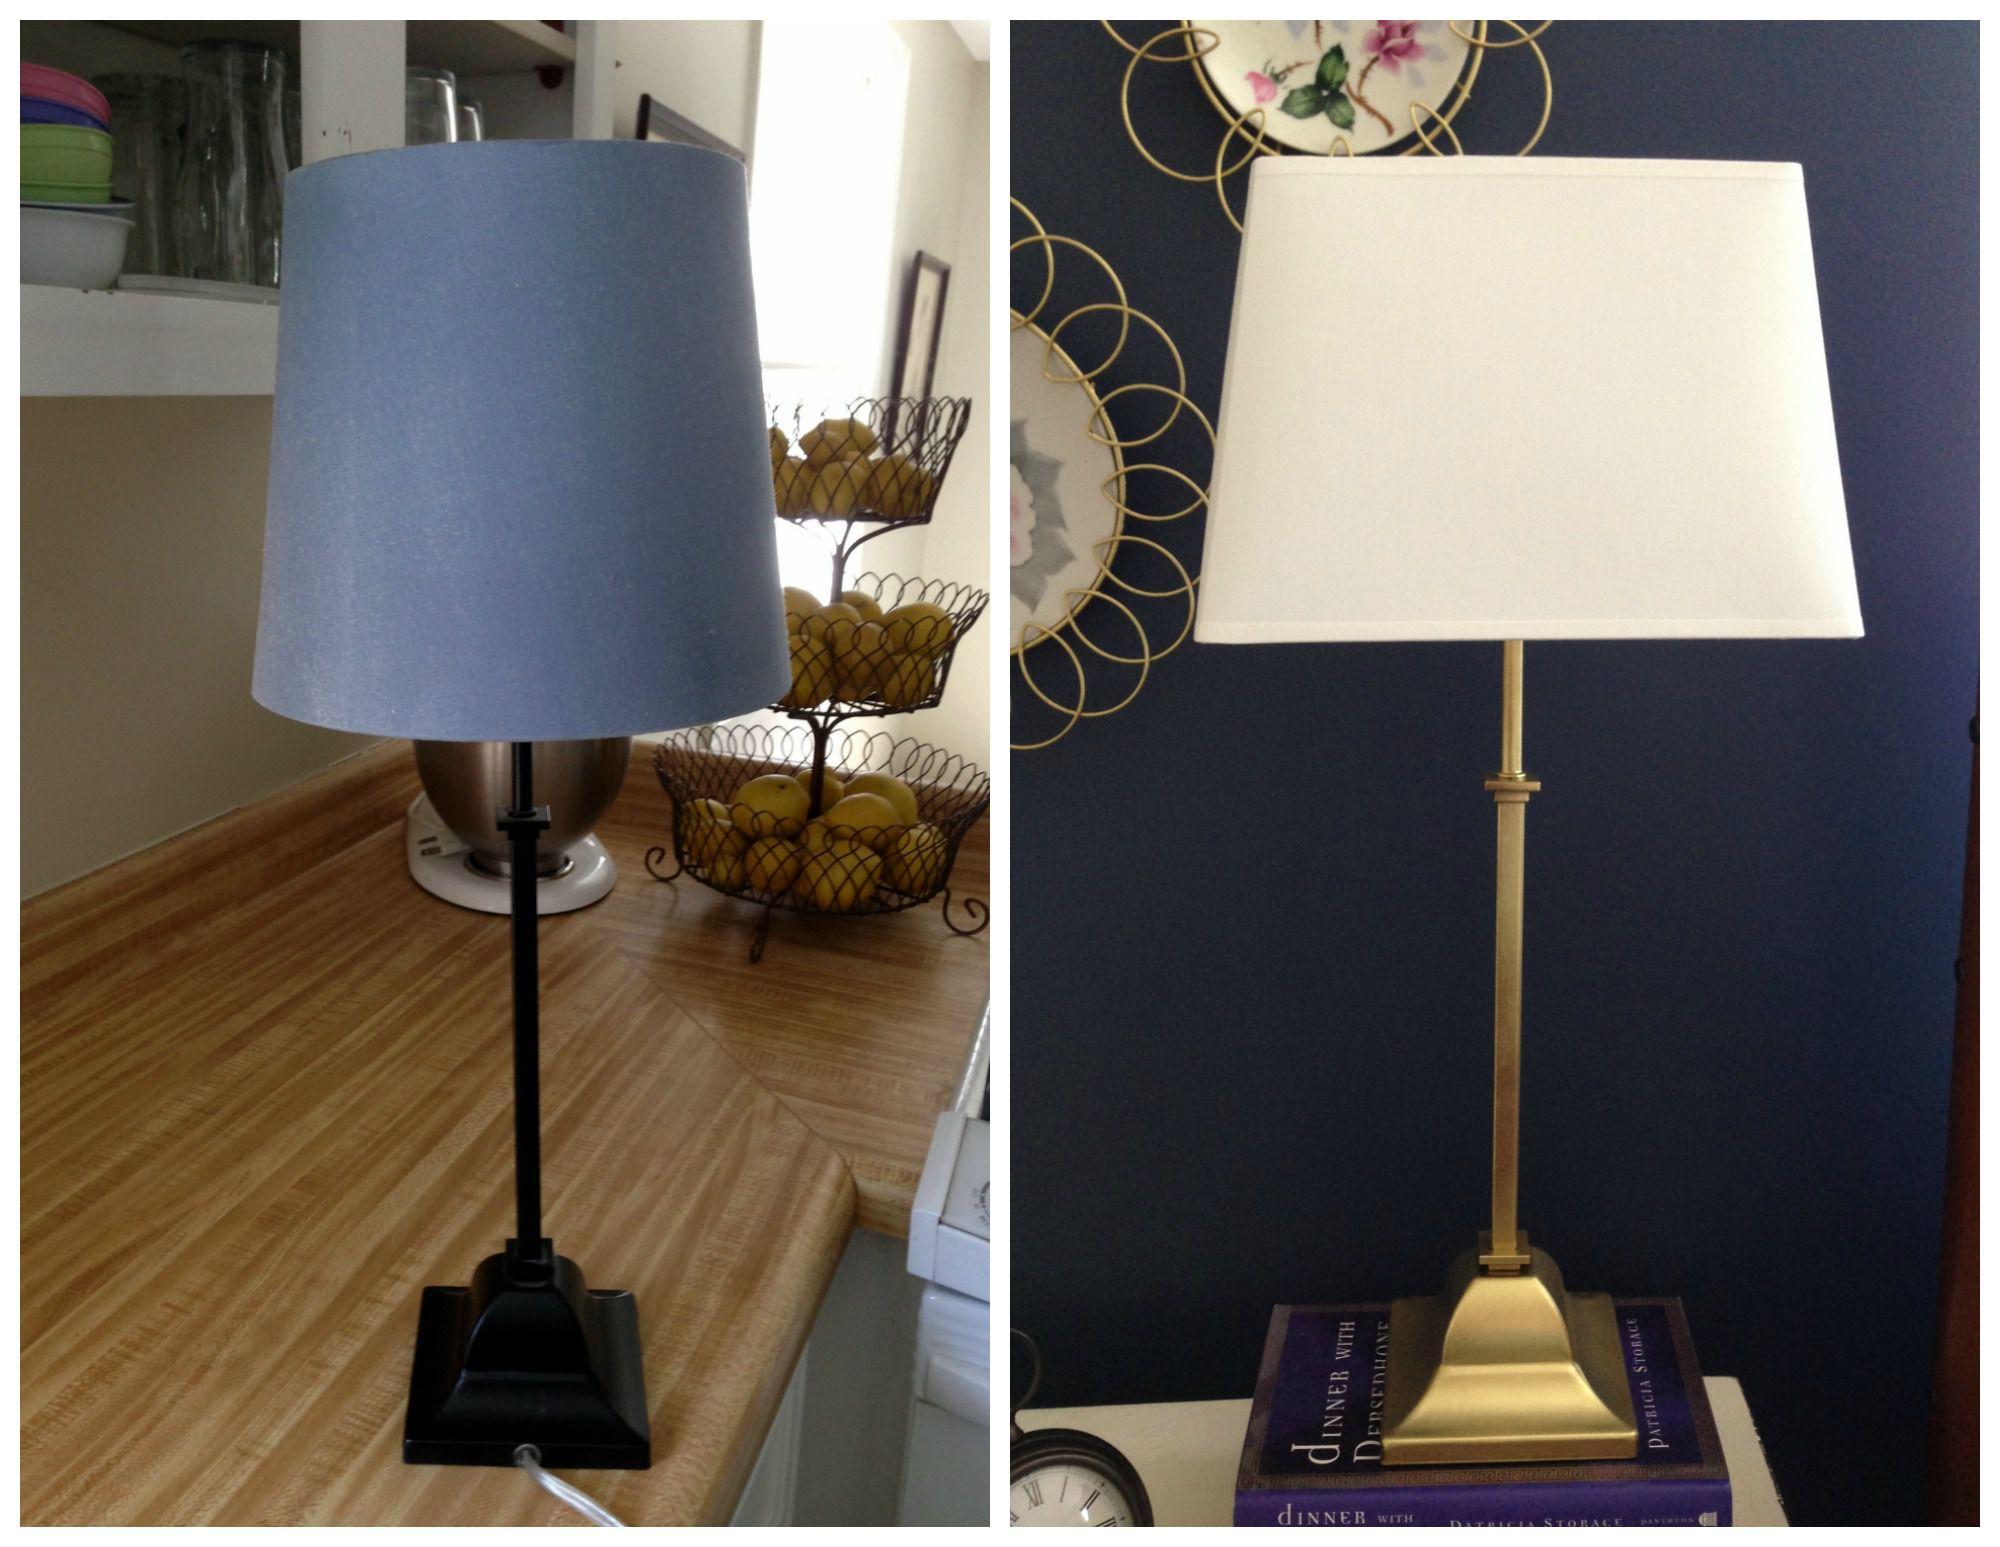 8 DIY Lamp Makeover Ideas for Diy Floor Lamp Makeover  173lyp